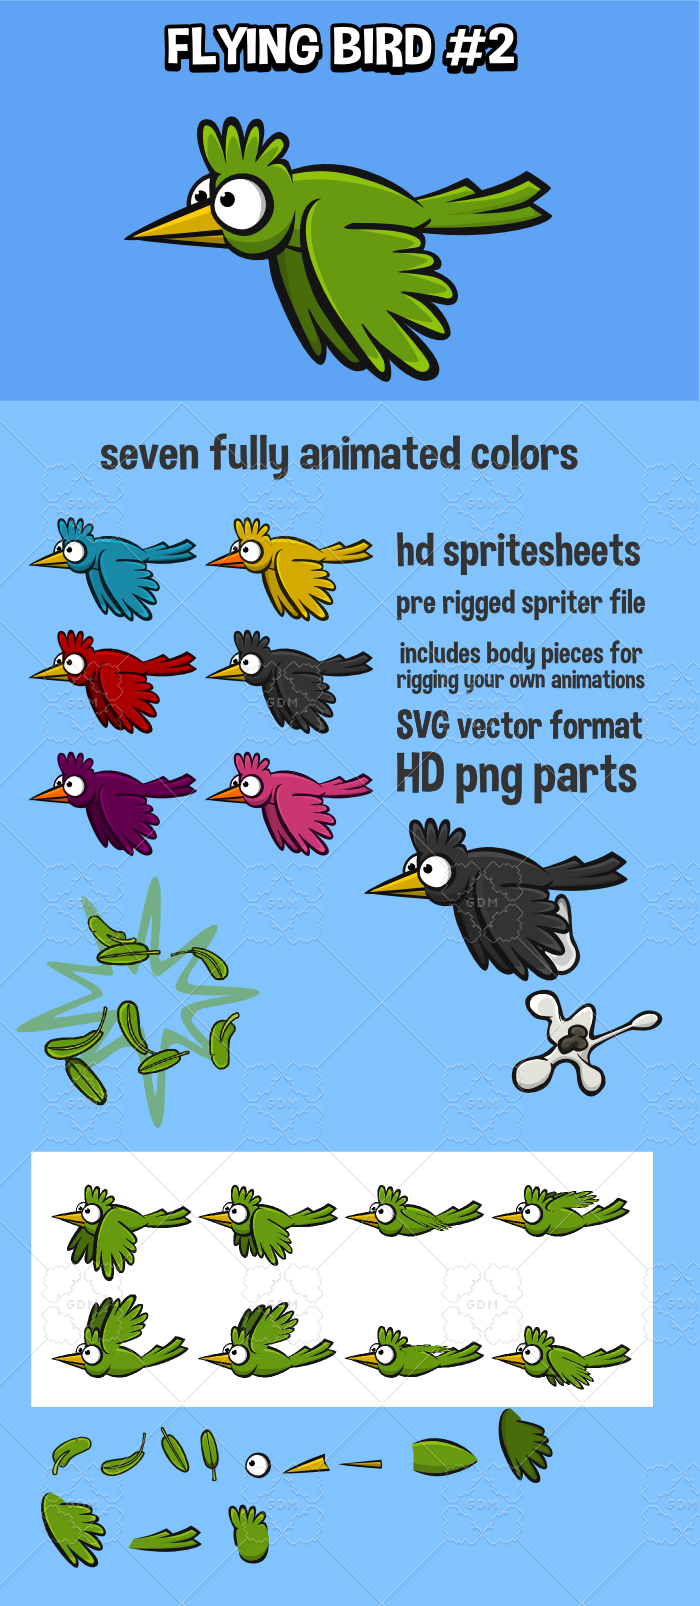 Animated flying bird 2